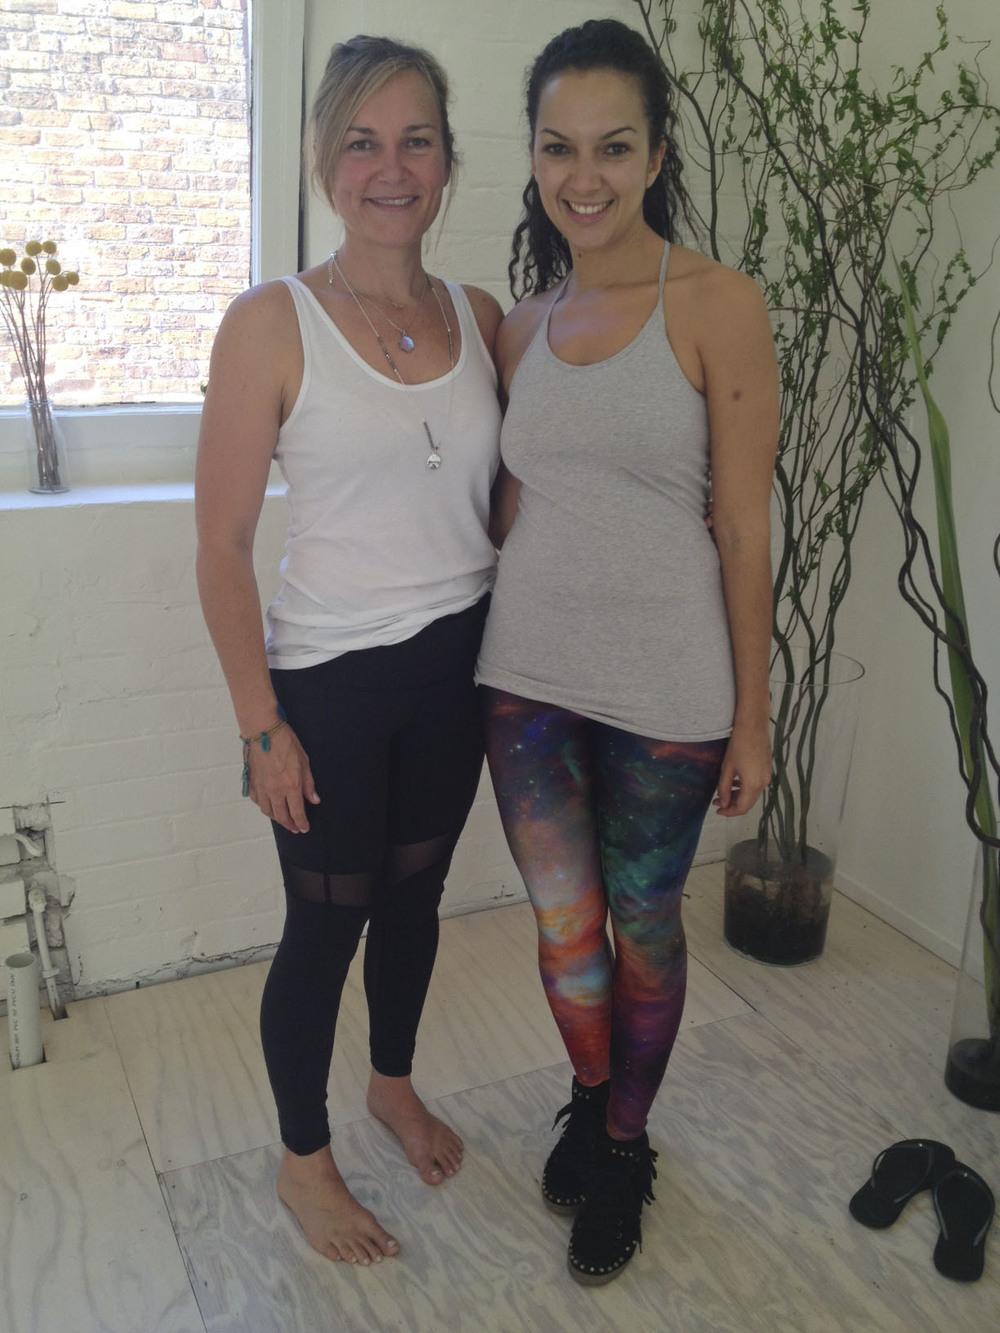 body flow yoga studio melbourne australia2789.jpg